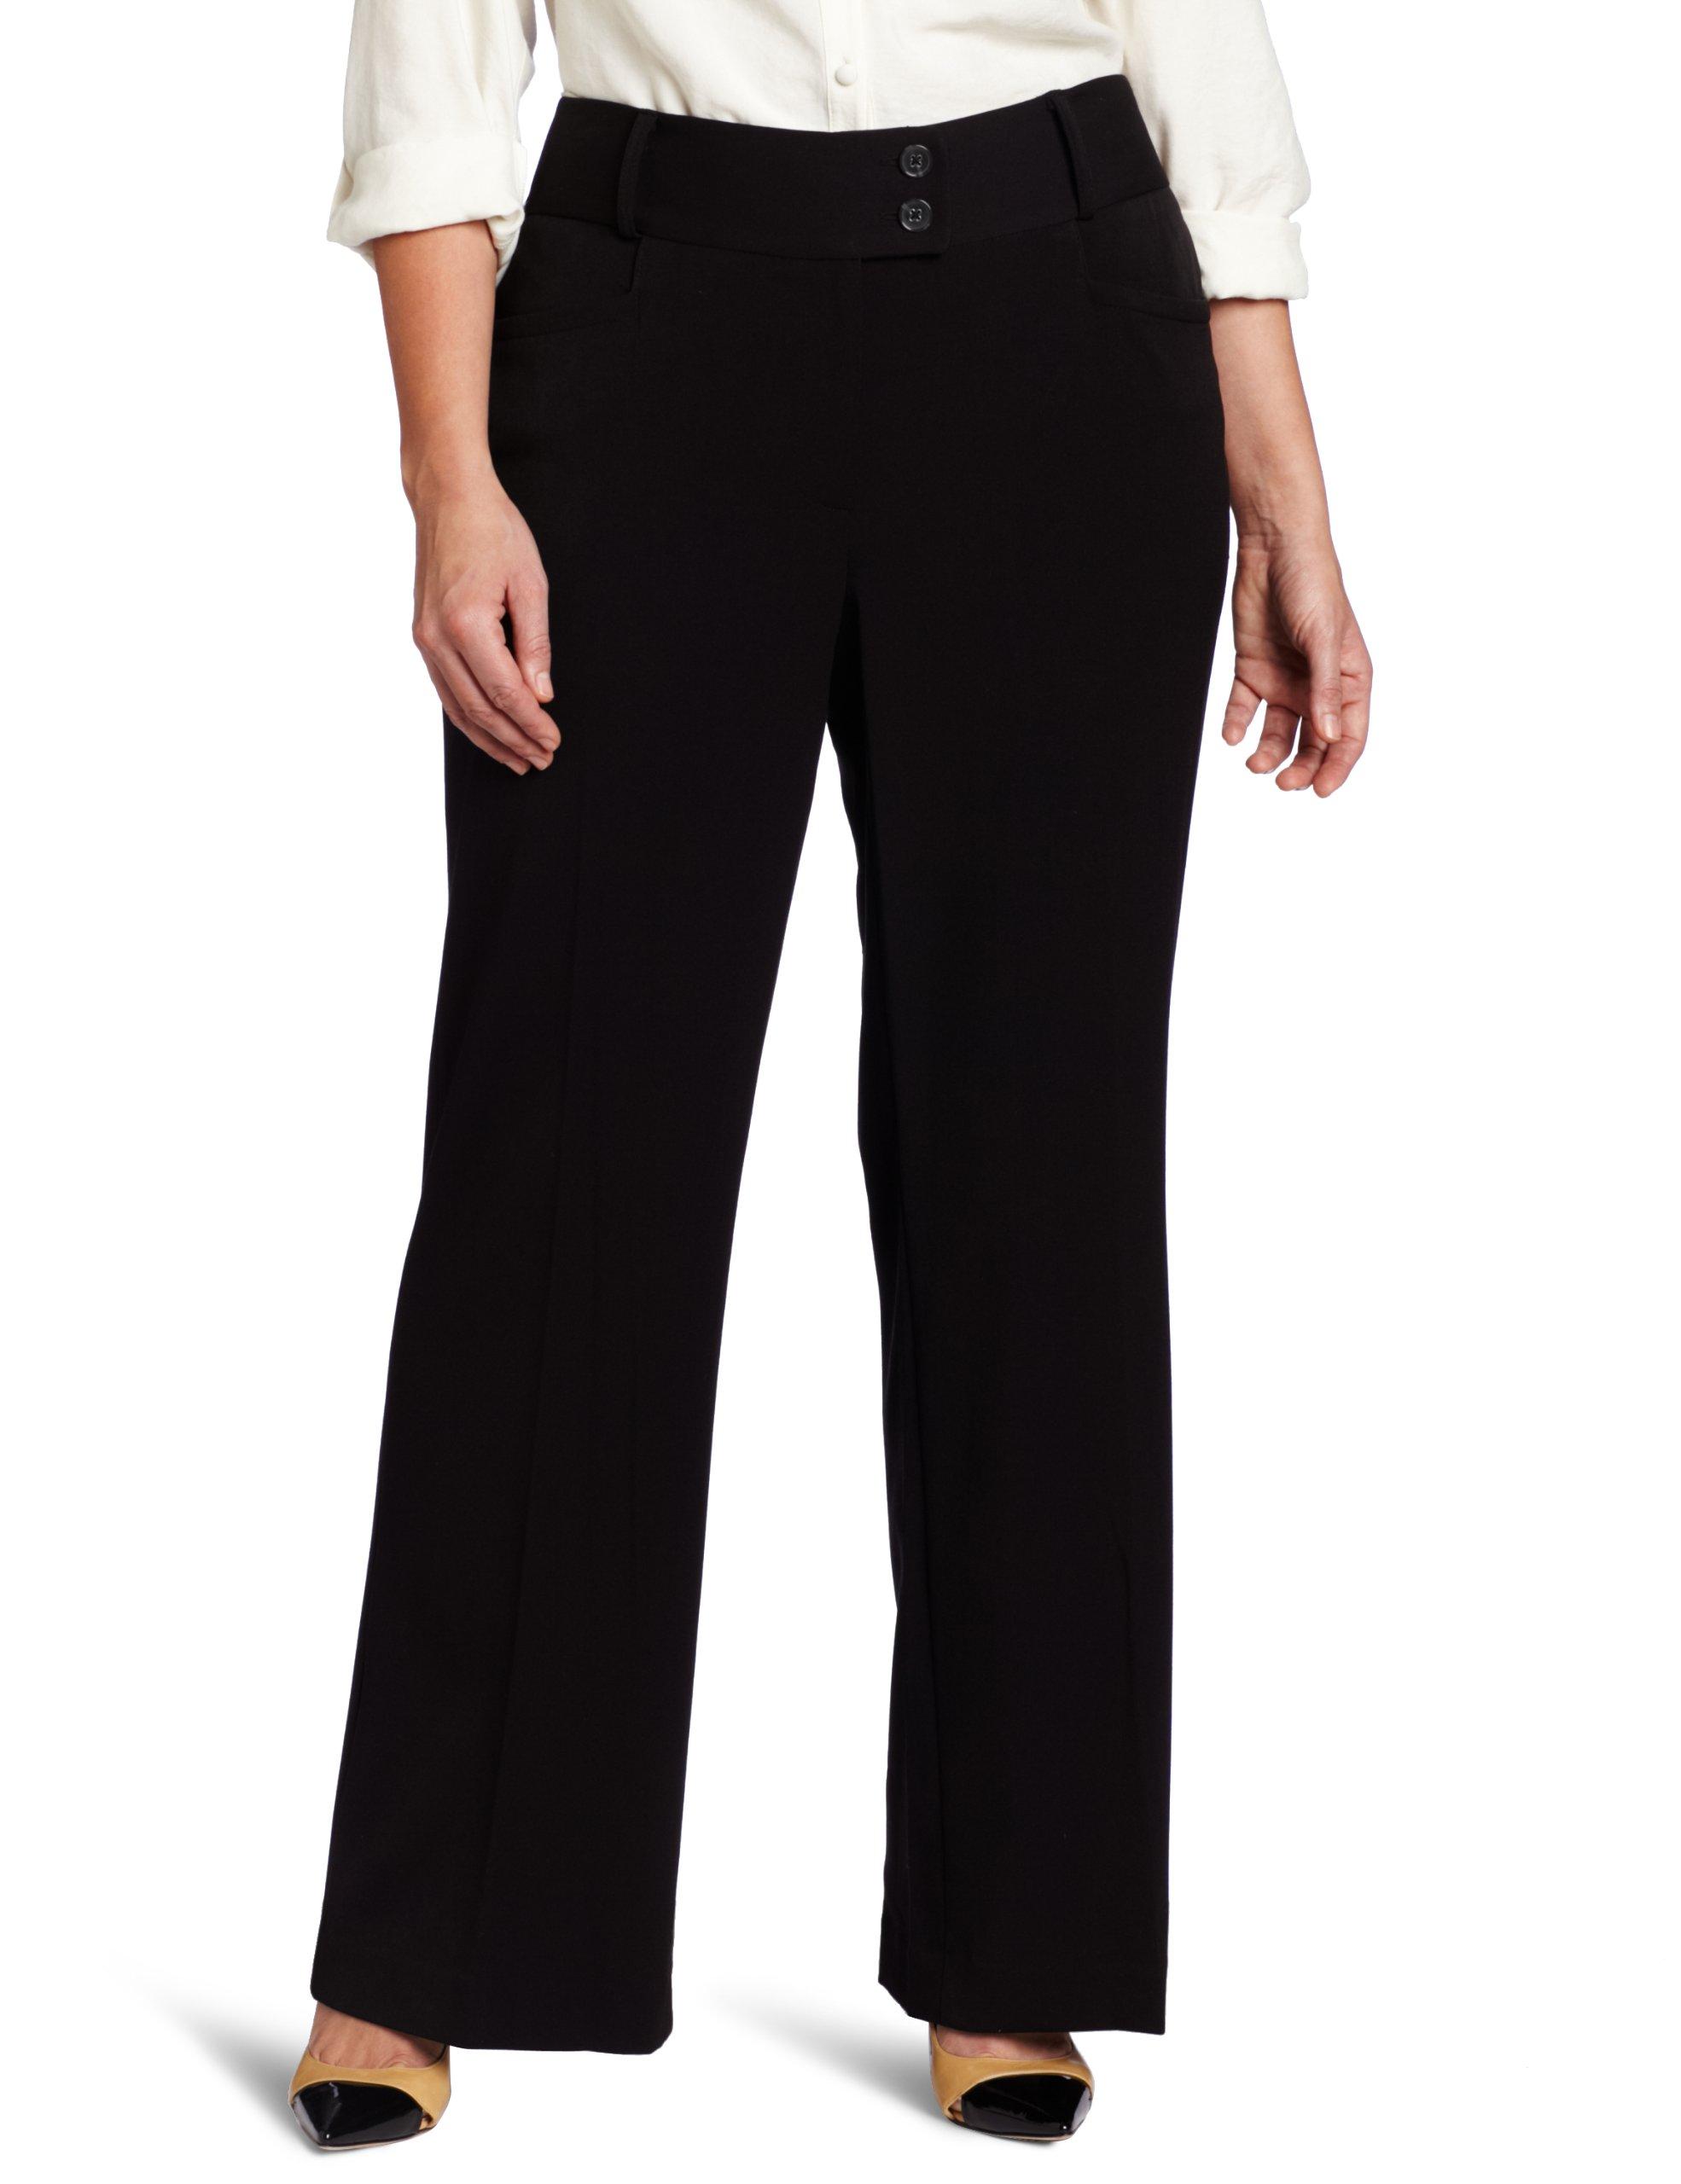 Rafaella Women's Plus-Size Curvy-Fit Gabardine Bootcut Trouser, Black, 20W by Rafaella (Image #1)